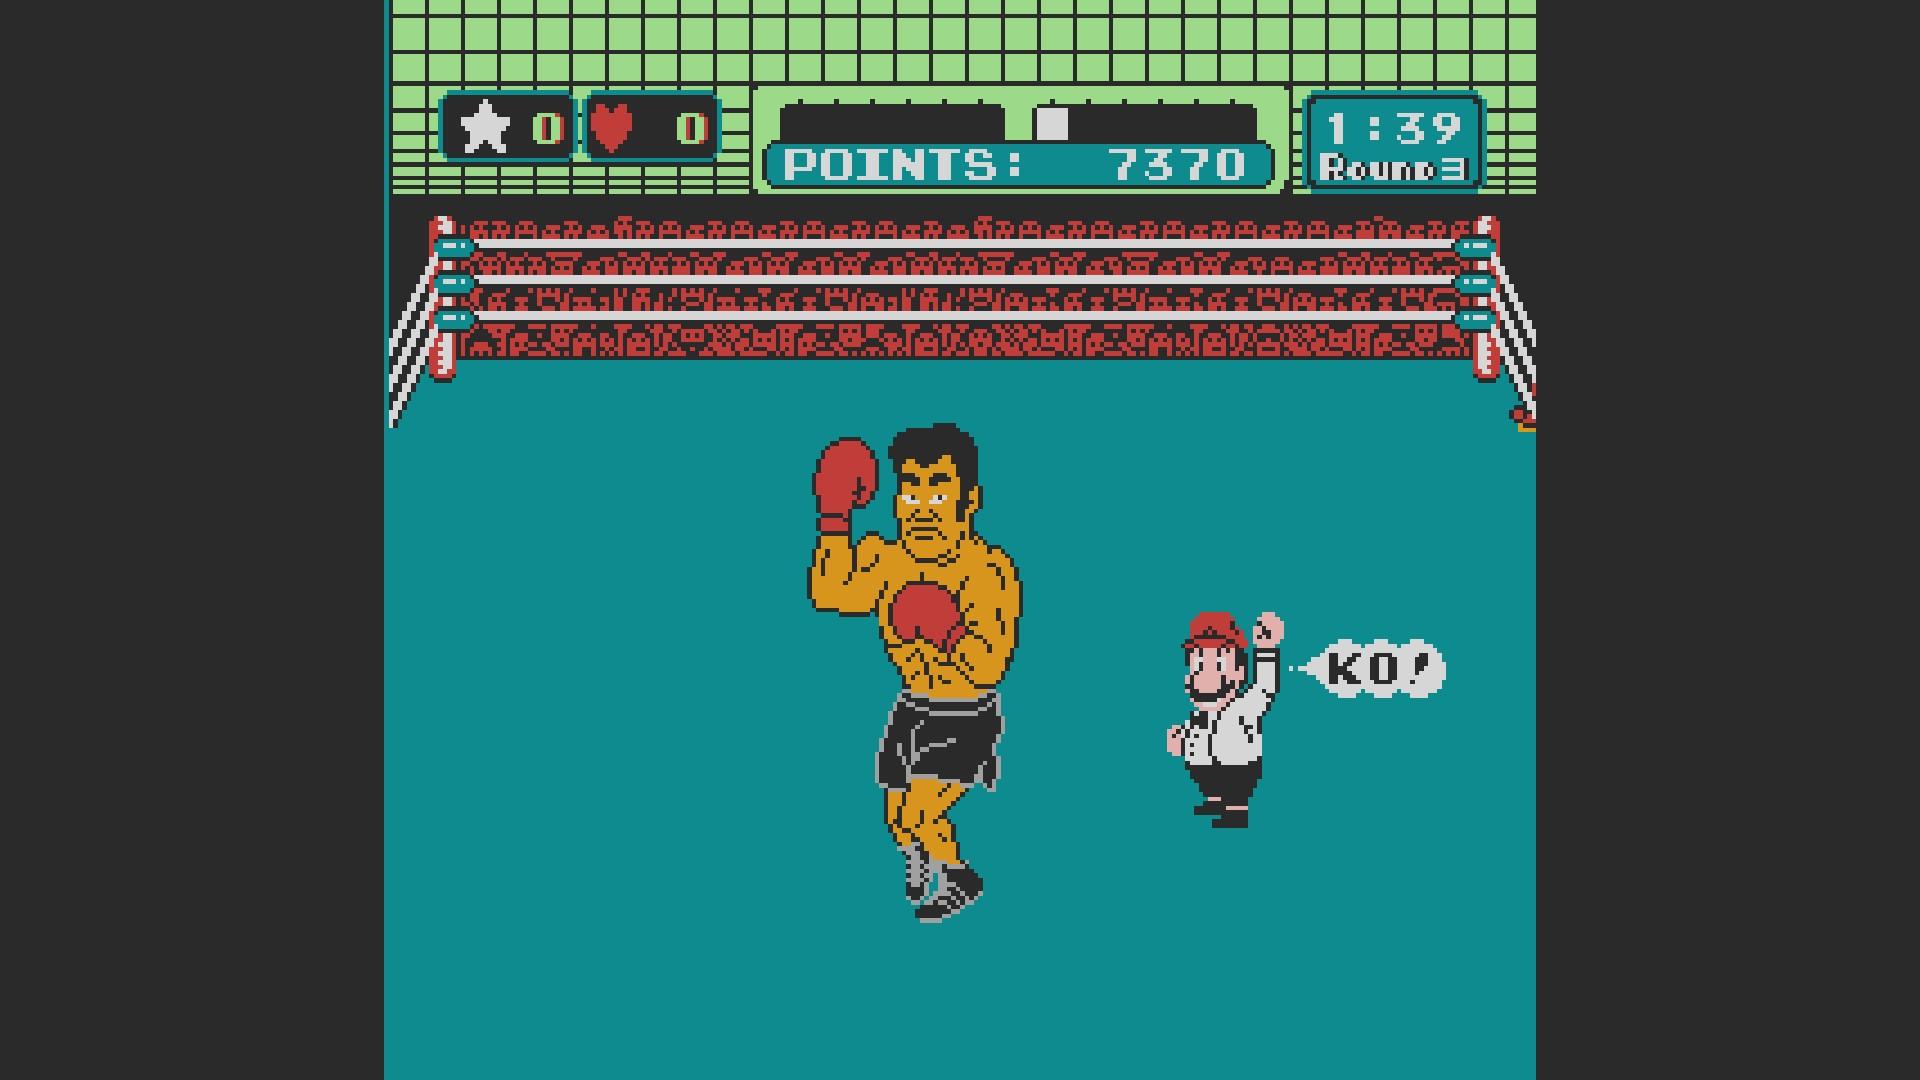 AkinNahtanoj: Mike Tyson